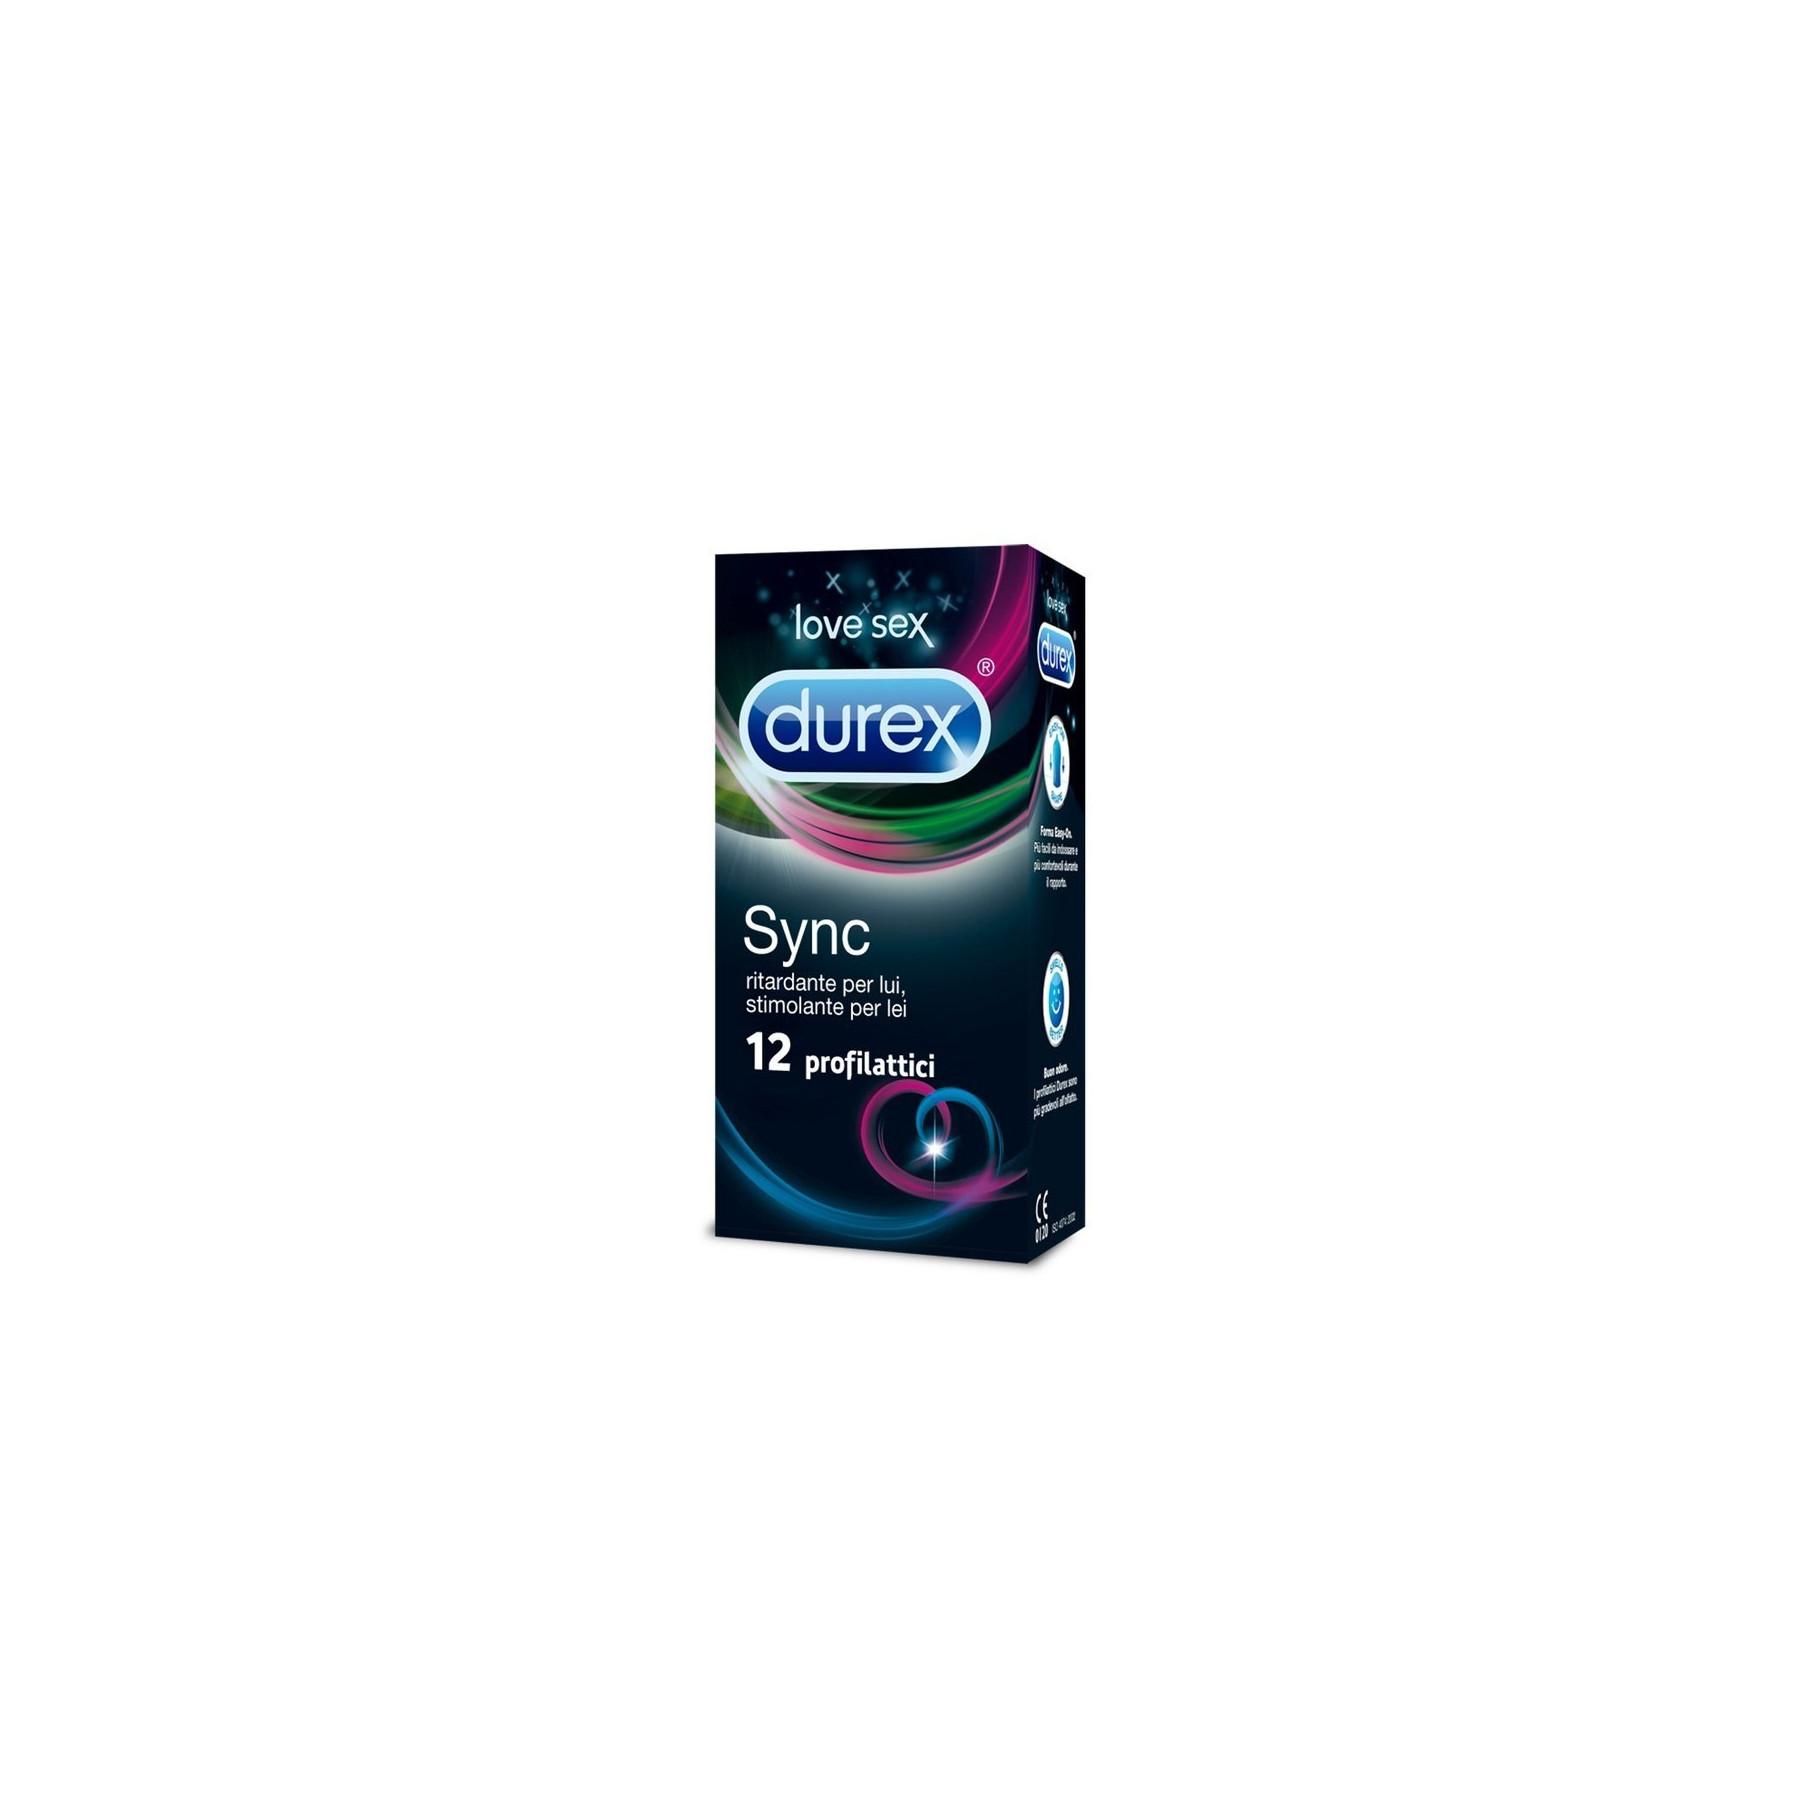 Preservativi Durex Sync Profilattici Stimolanti e Ritardanti